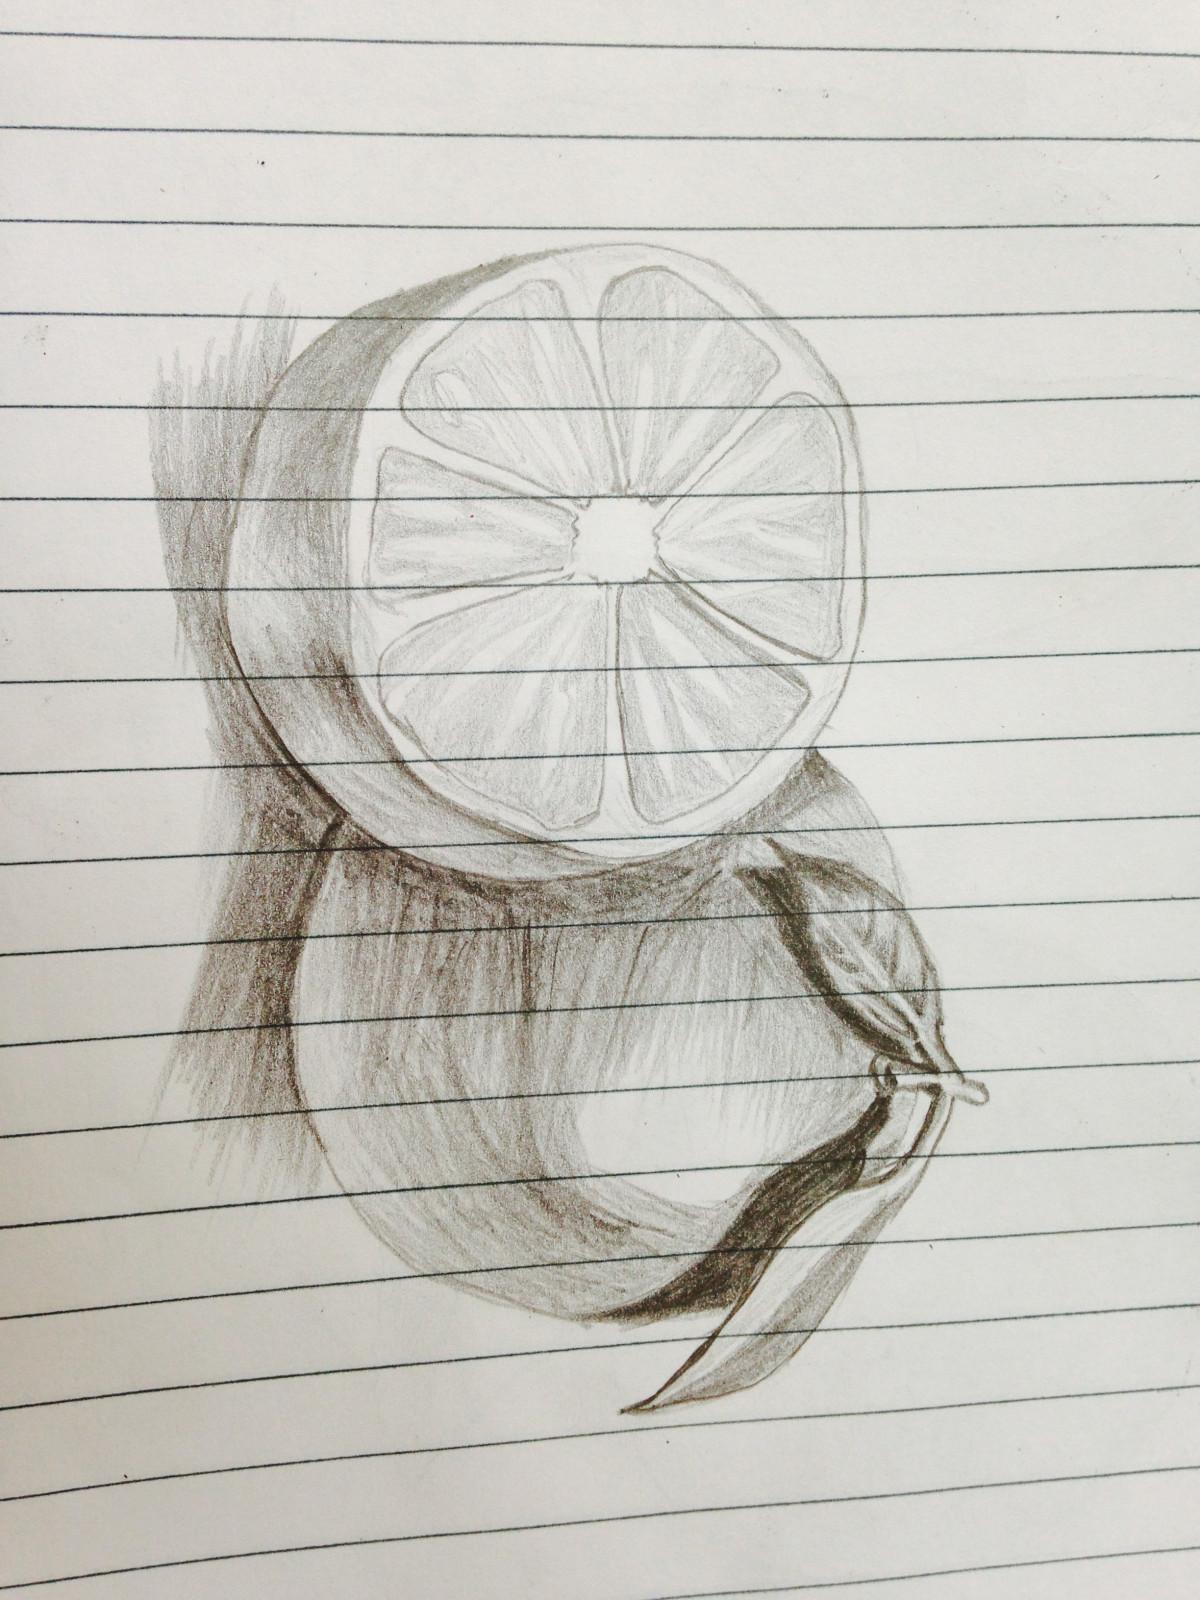 Gambar Karya Seni Sketsa Ilustrasi Tangan Gambar Pensil